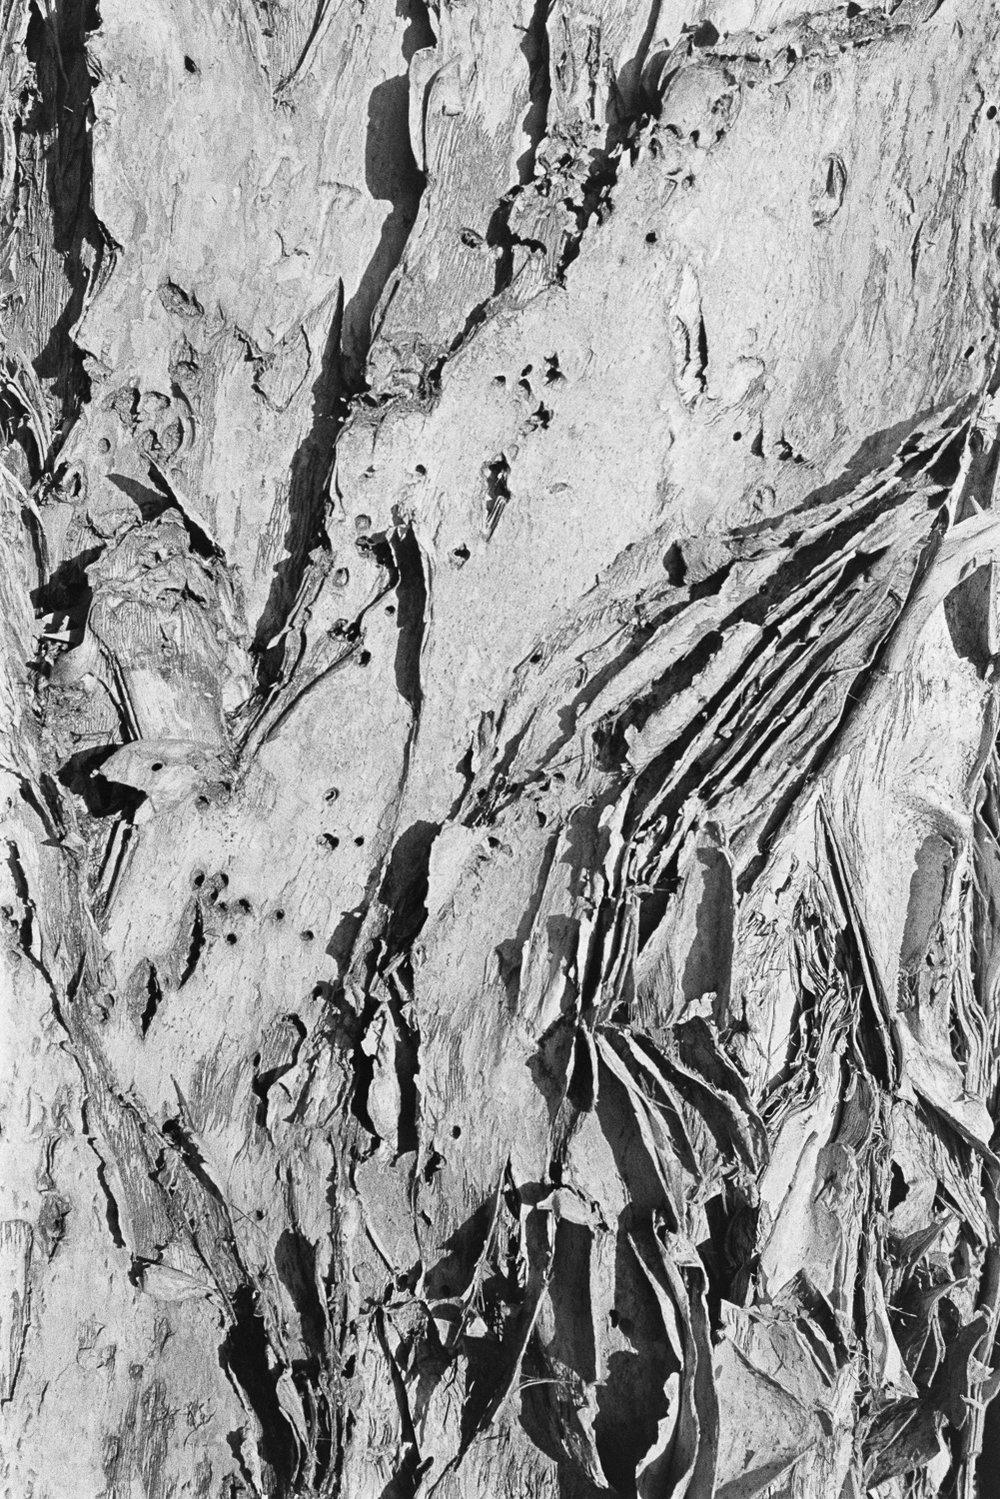 Paper bark